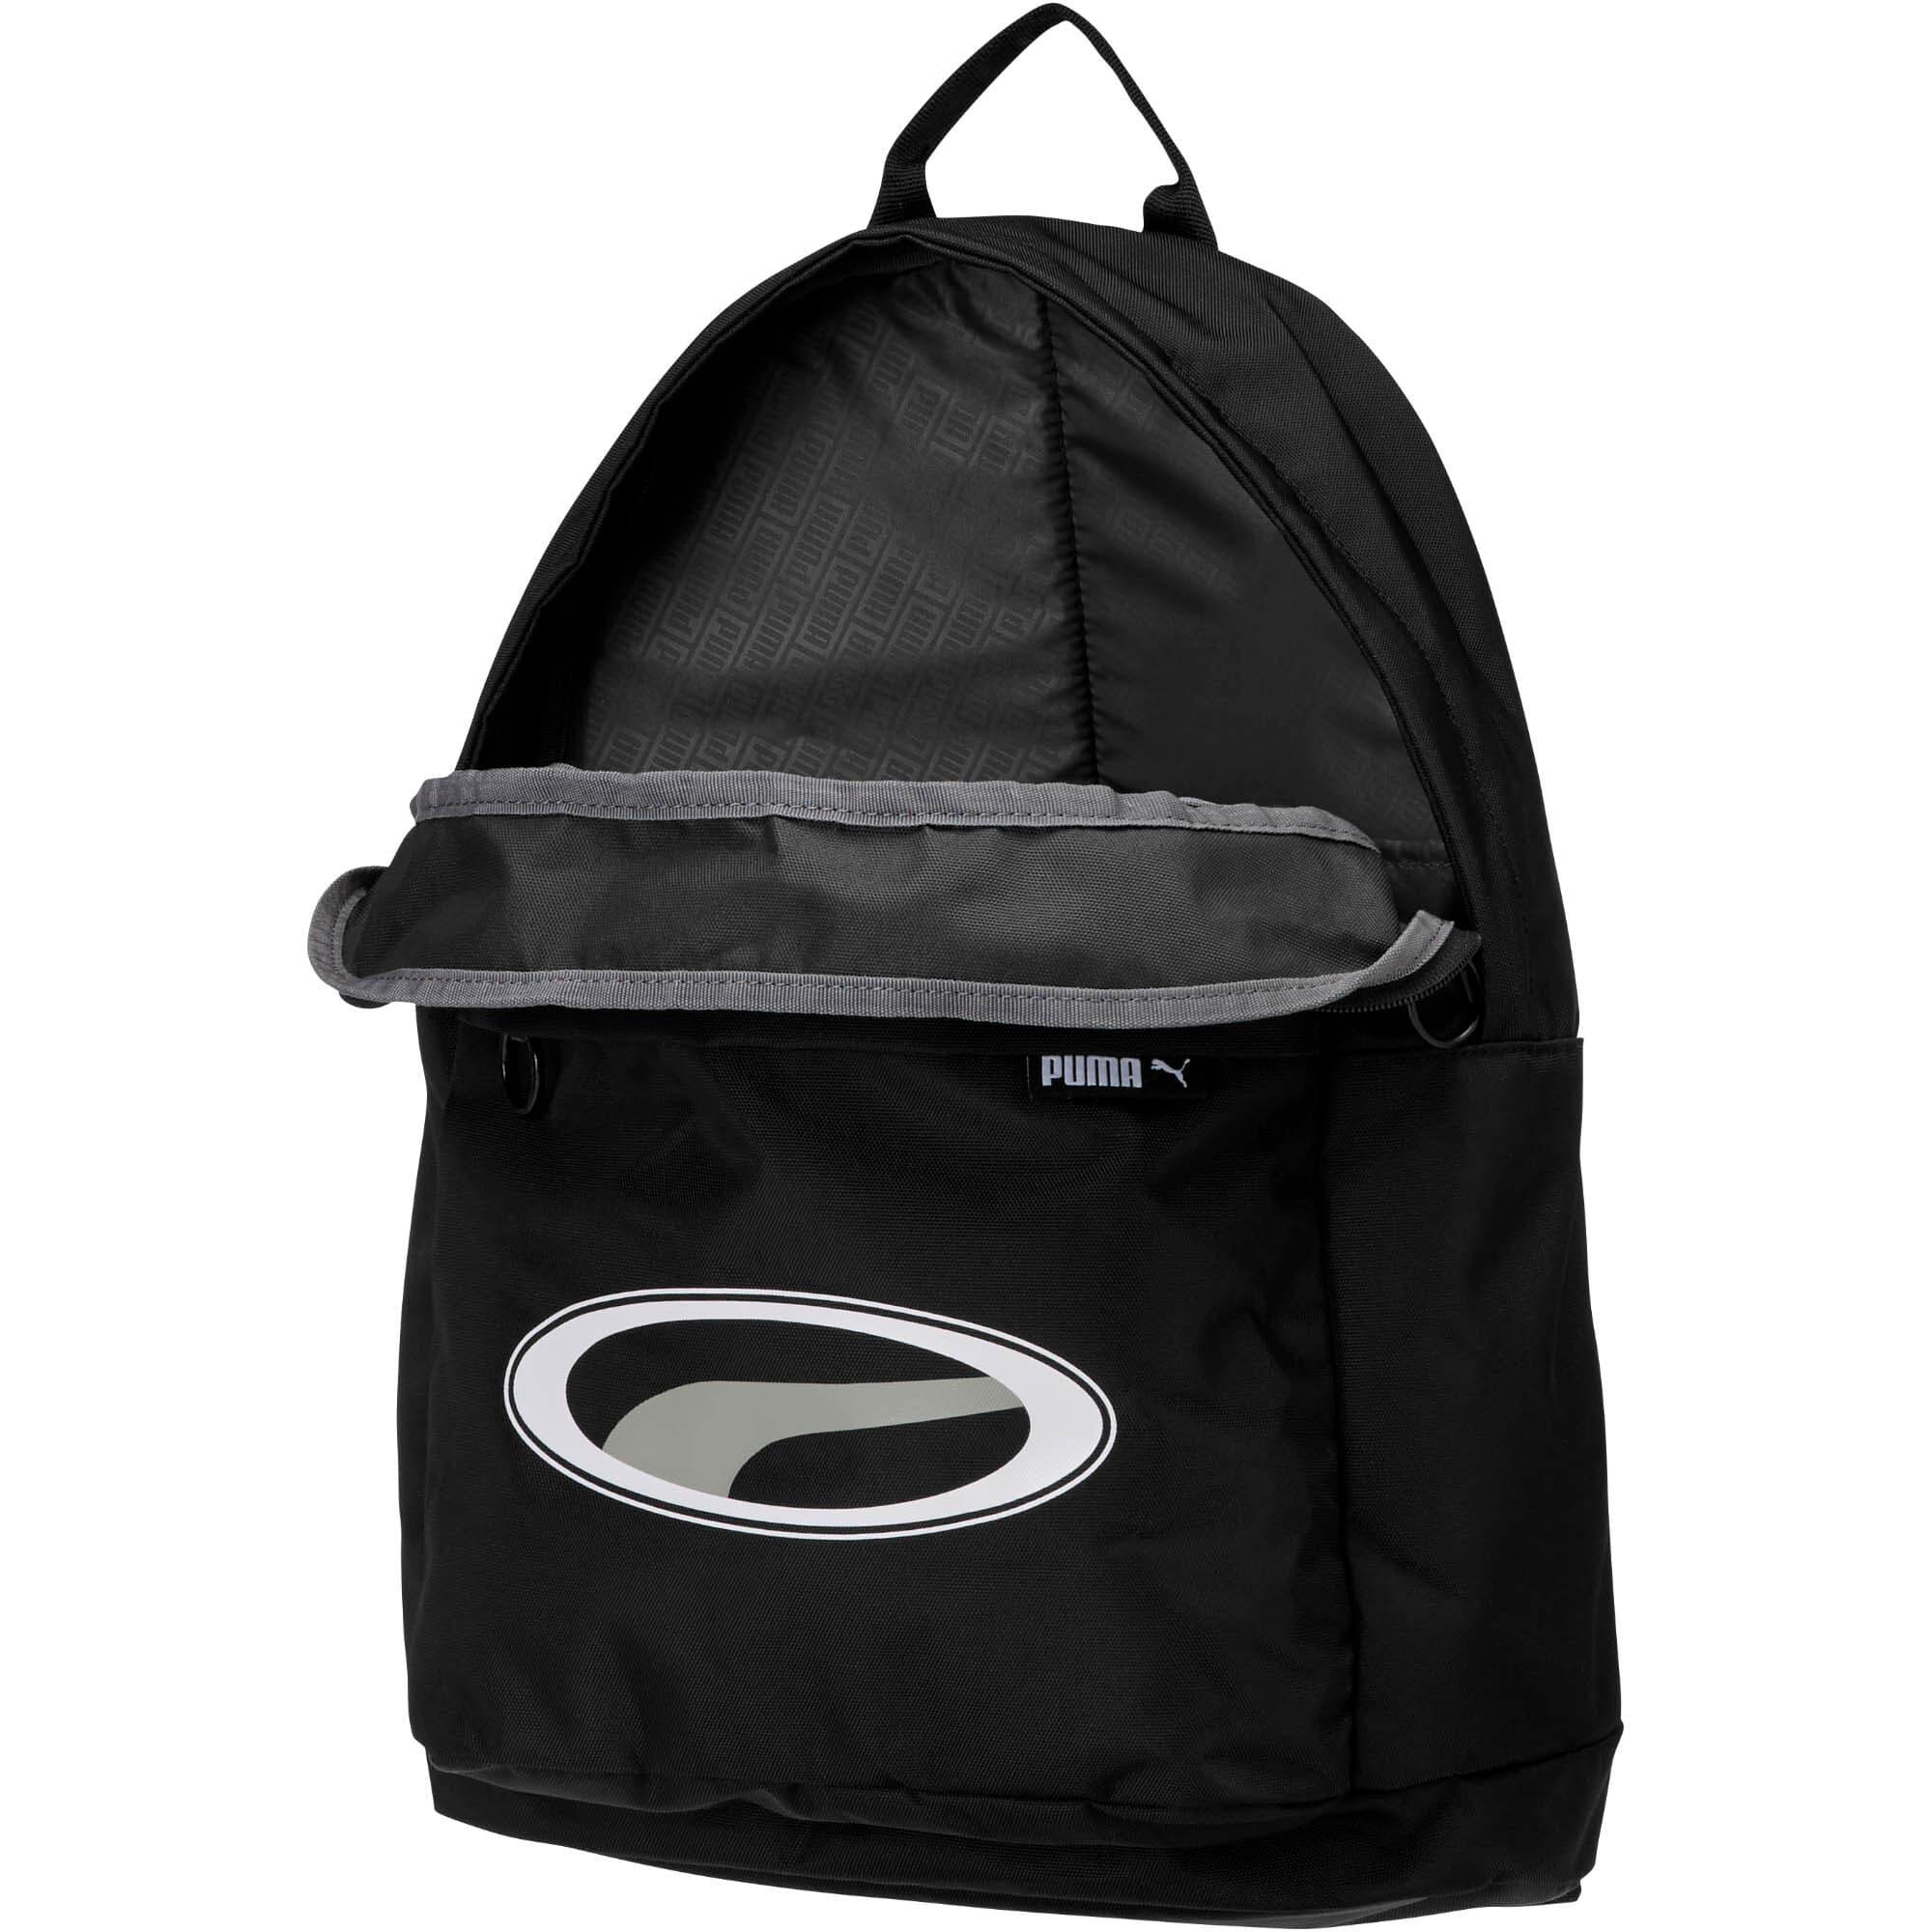 Thumbnail 2 of Originals CELL Backpack, Puma Black-Cell OG SL9, medium